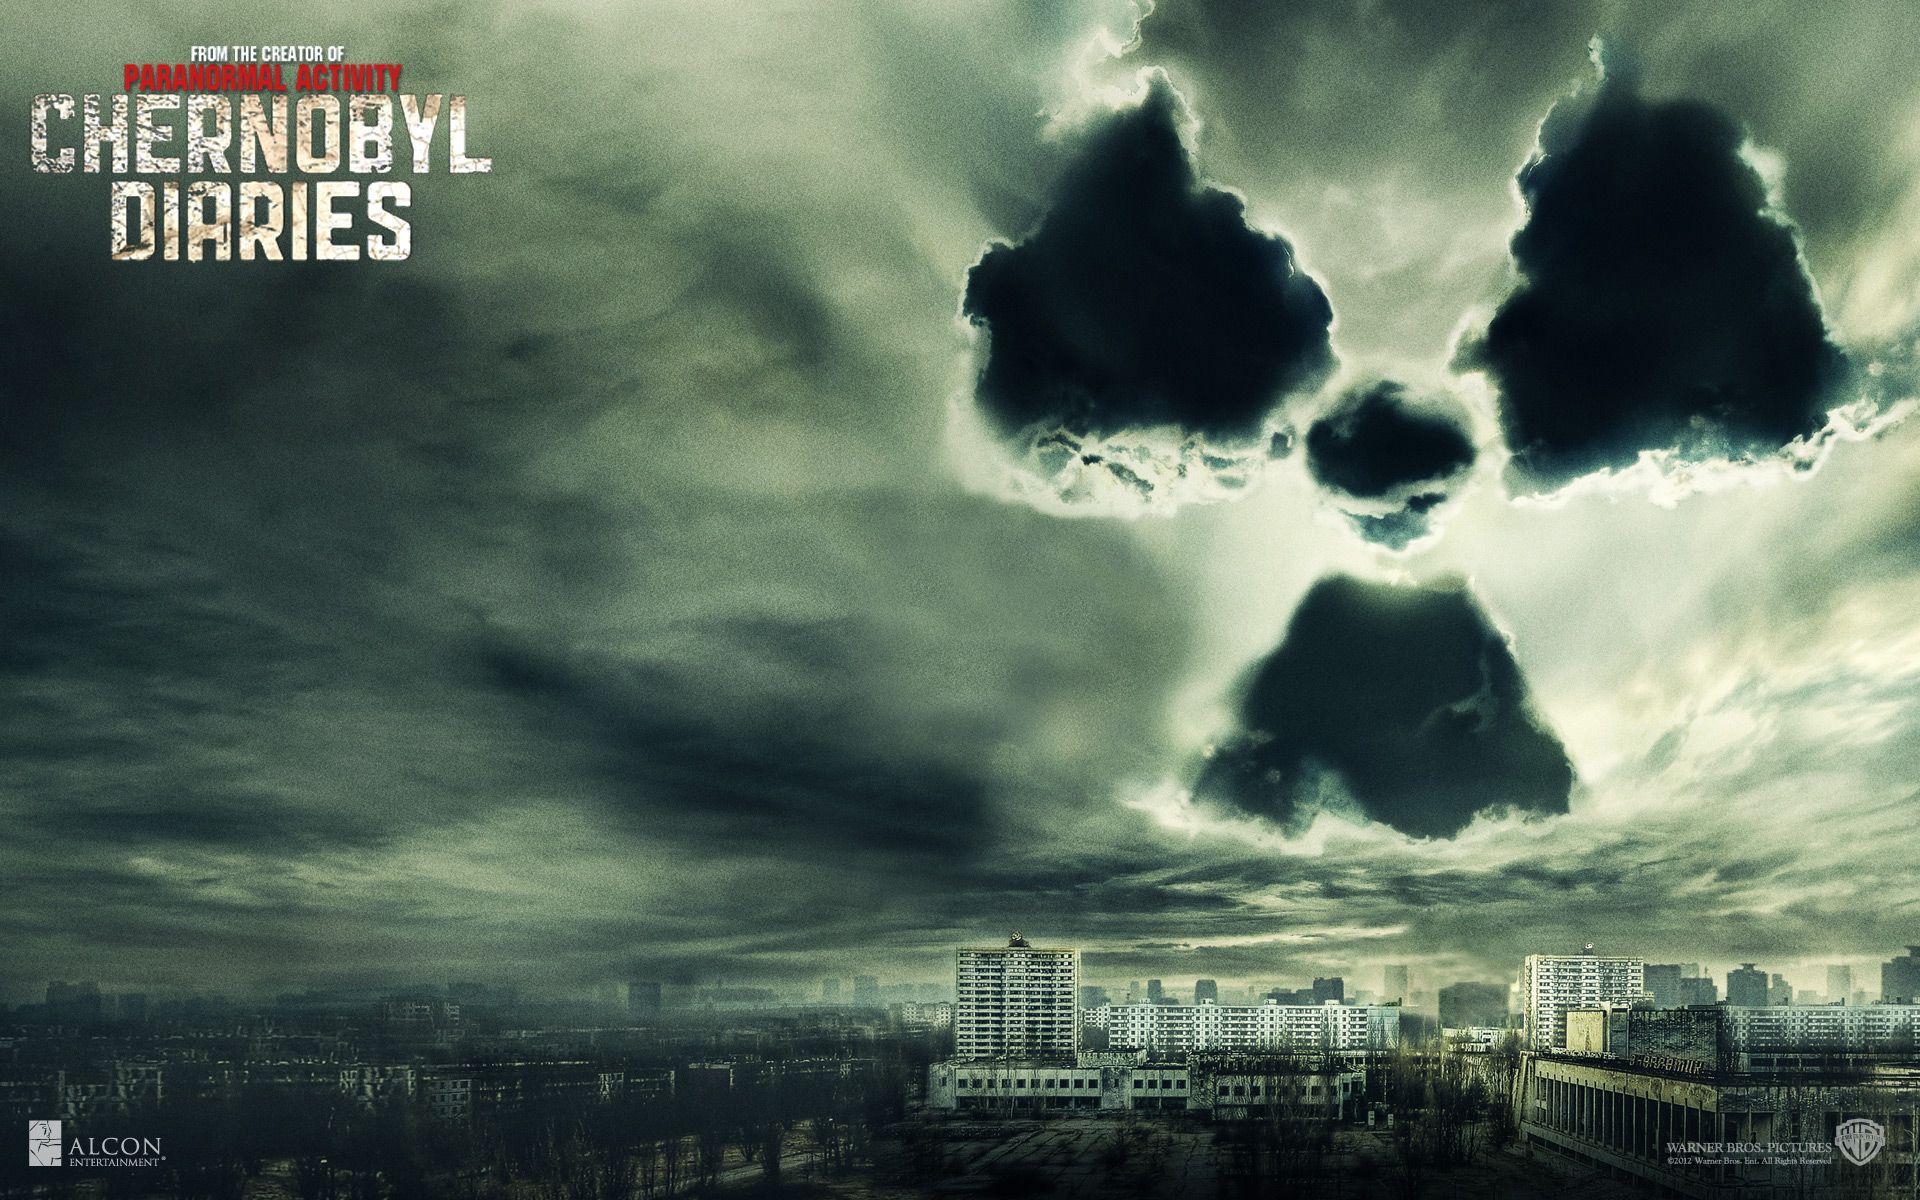 Watch Streaming Hd Chernobyl Diaries Starring Jesse Mccartney